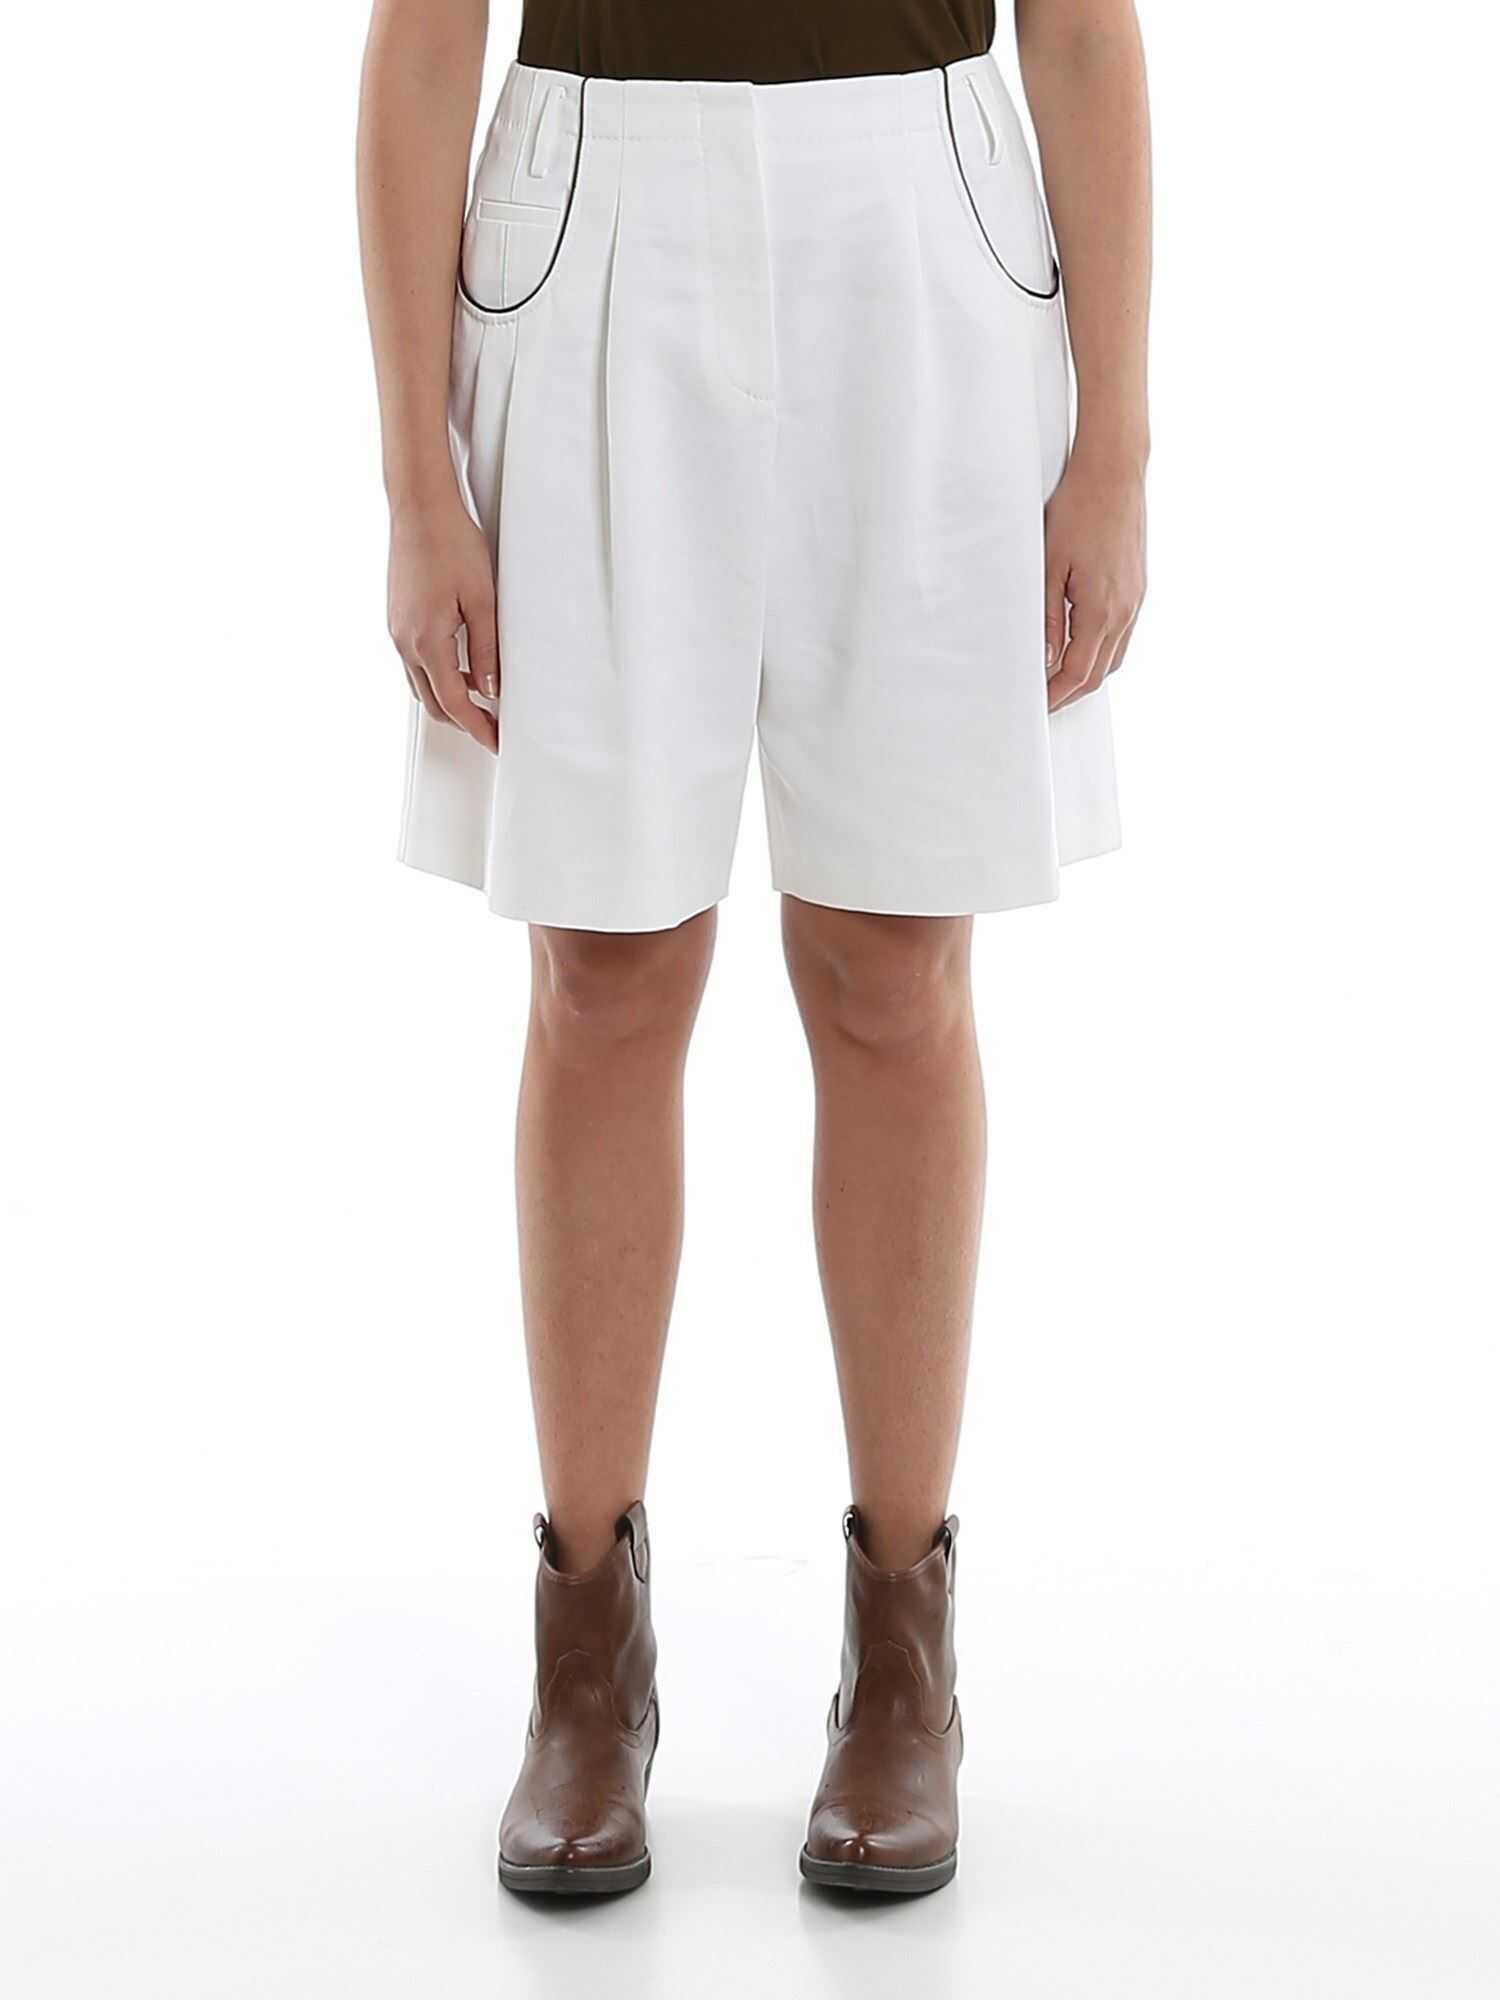 Giorgio Armani Contrasting Piping Gabardine Shorts White